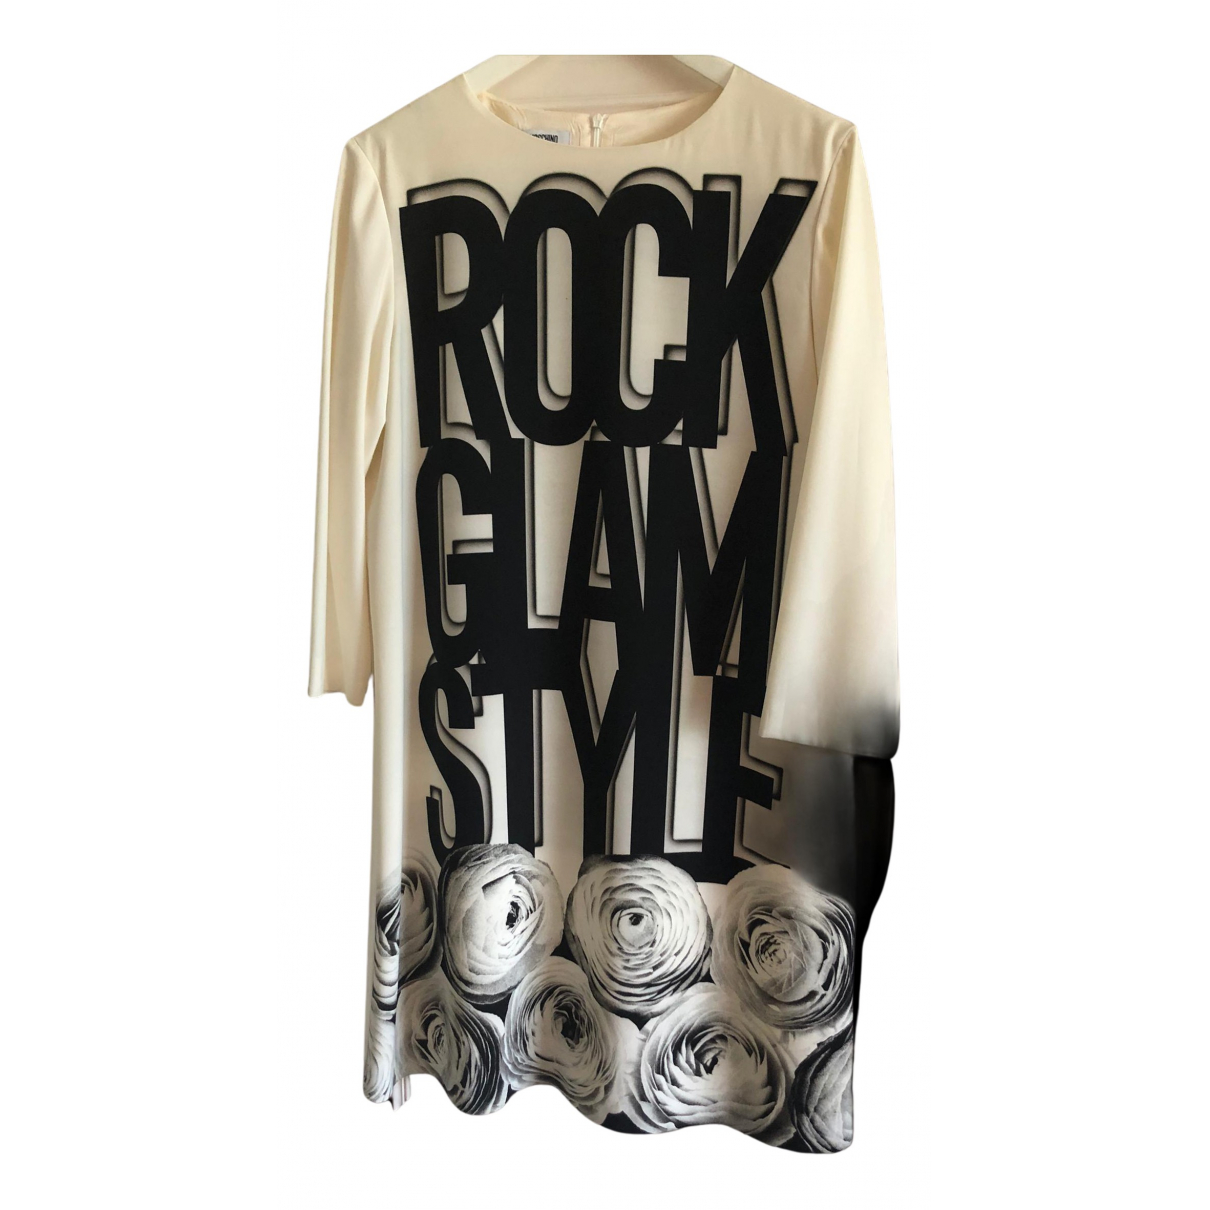 Moschino \N Kleid in  Ecru Polyester